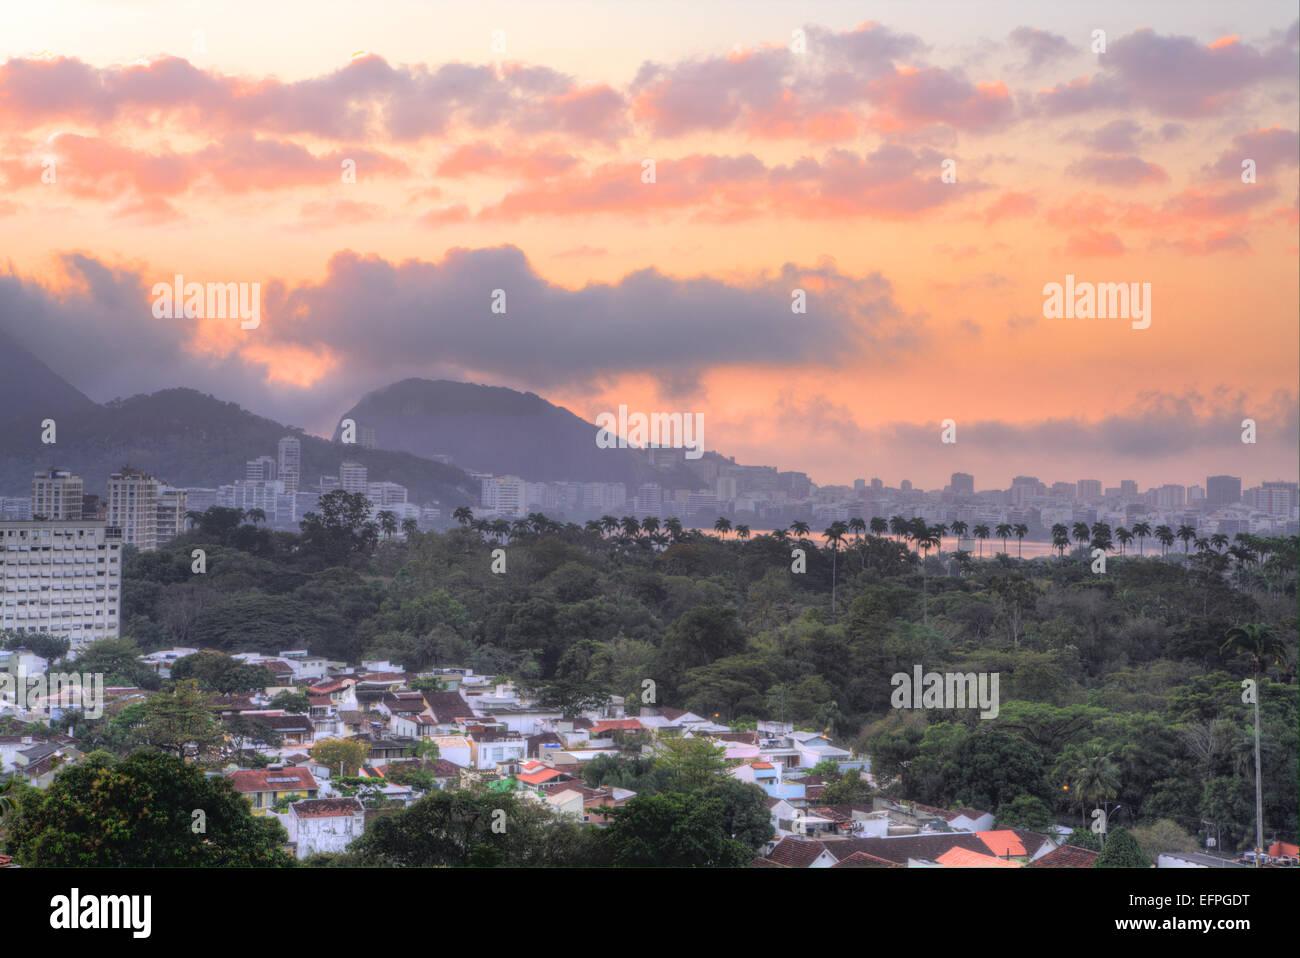 View of Rodrigo de Freitas lagoon and the Botanical Gardens district at dawn, Rio de Janeiro, Brazil, South America - Stock Image